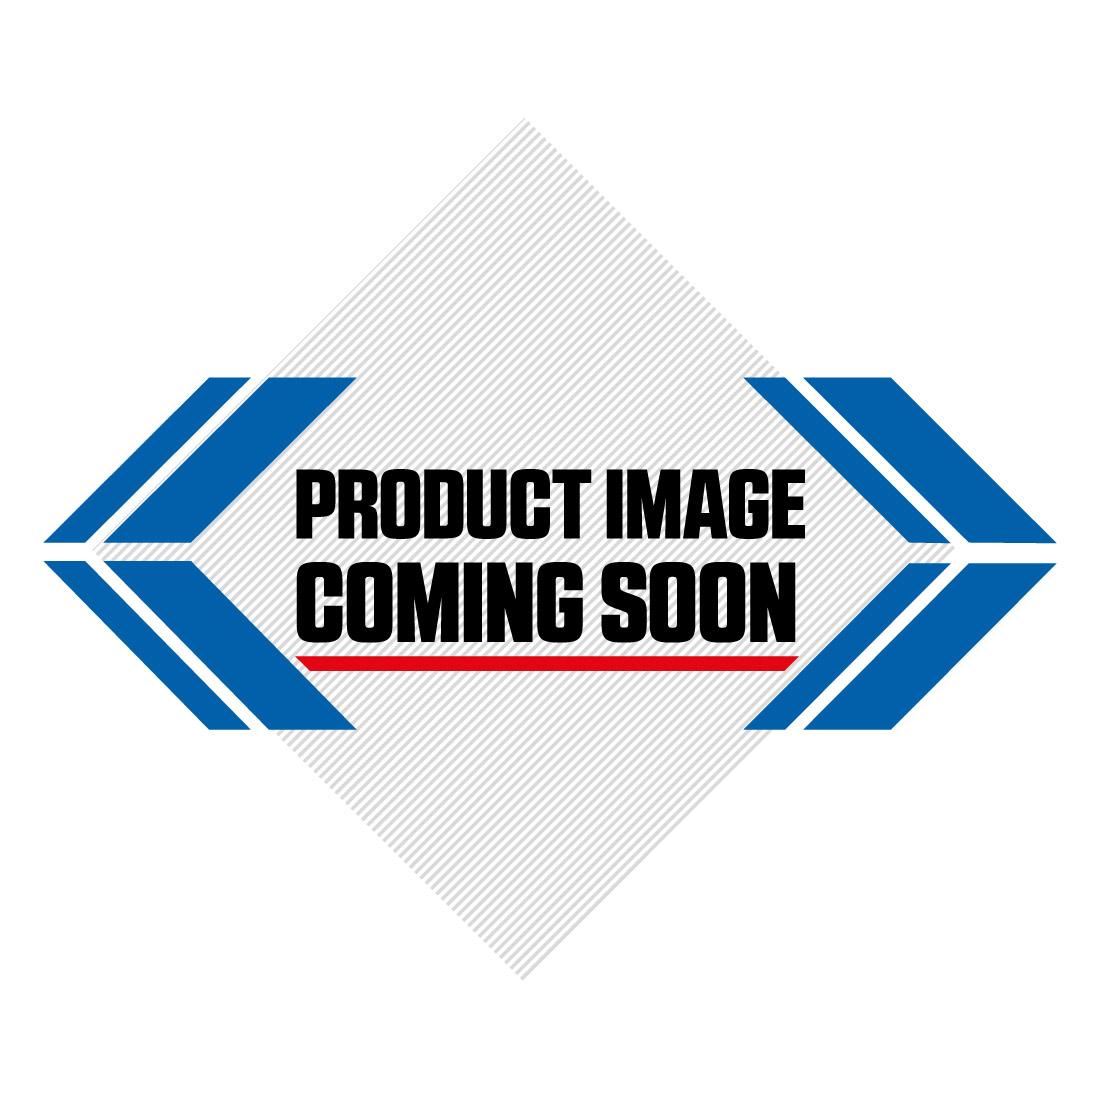 Sidi Crossfire 3 SRS Motocross Boots - TC222 Cairoli LTD Edition Image-3